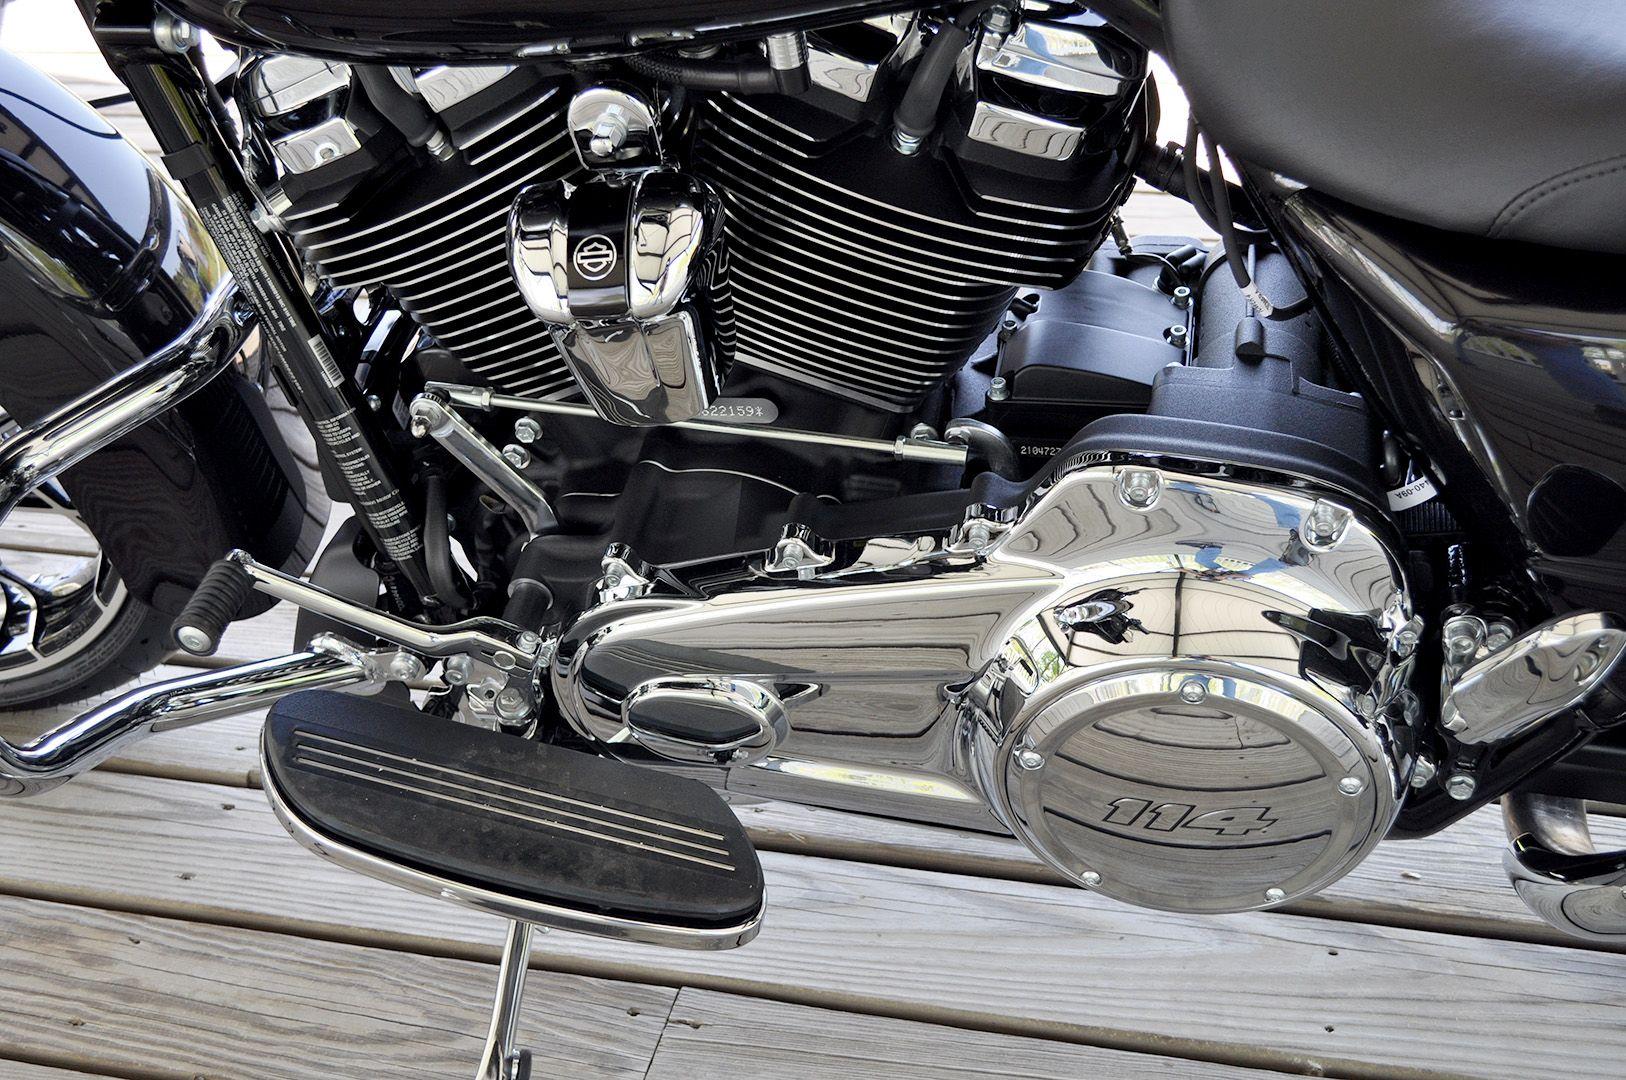 New 2021 Harley-Davidson Street Glide Special